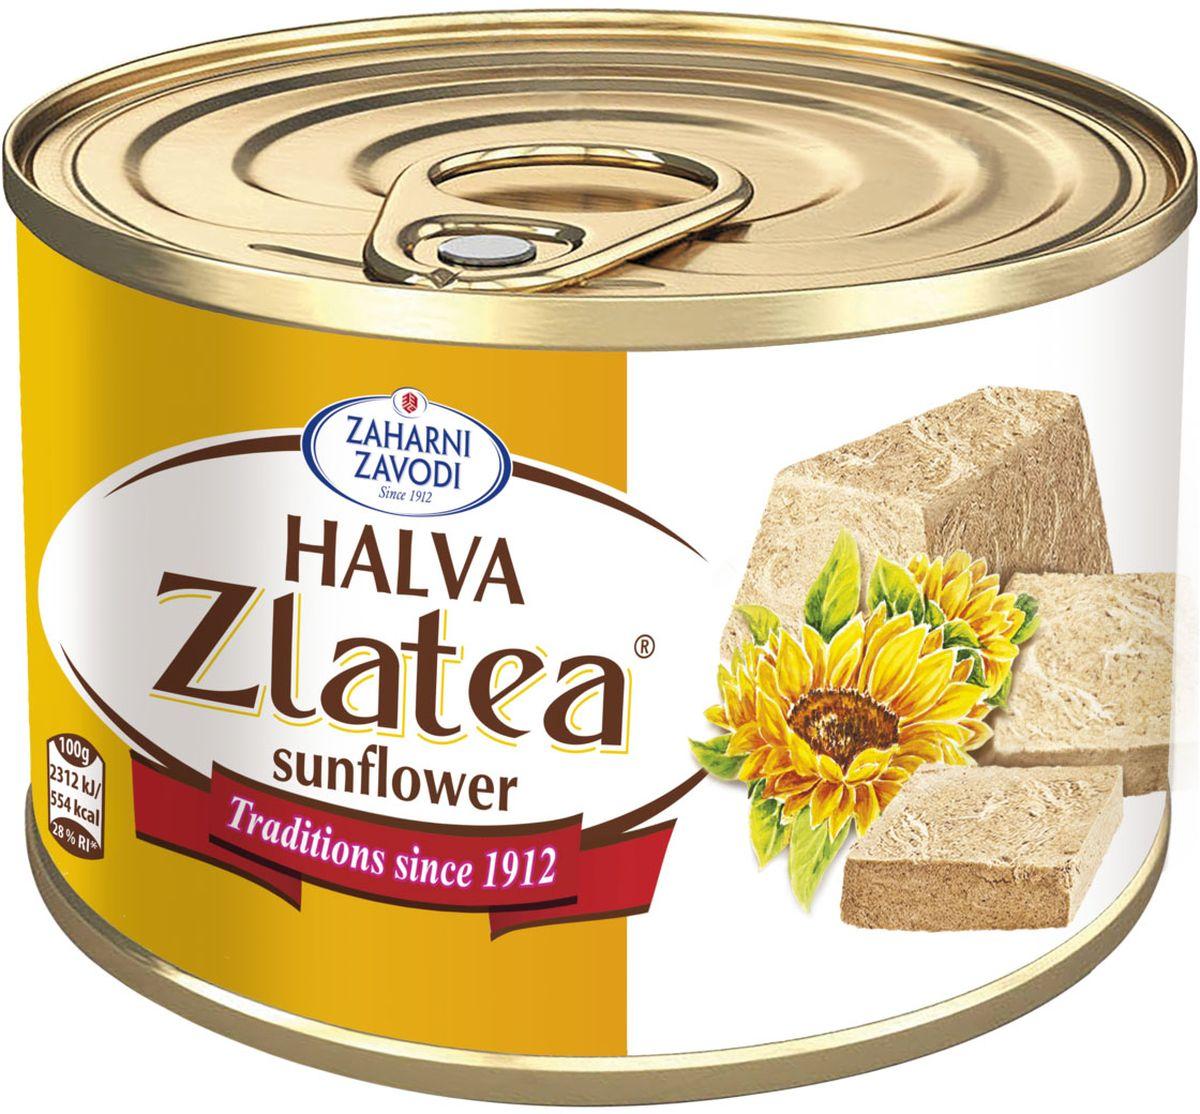 Zaharni Zavodi Zlatea Подсолнечная халва, 420 г zaharni zavodi zlatea подсолнечная халва 420 г